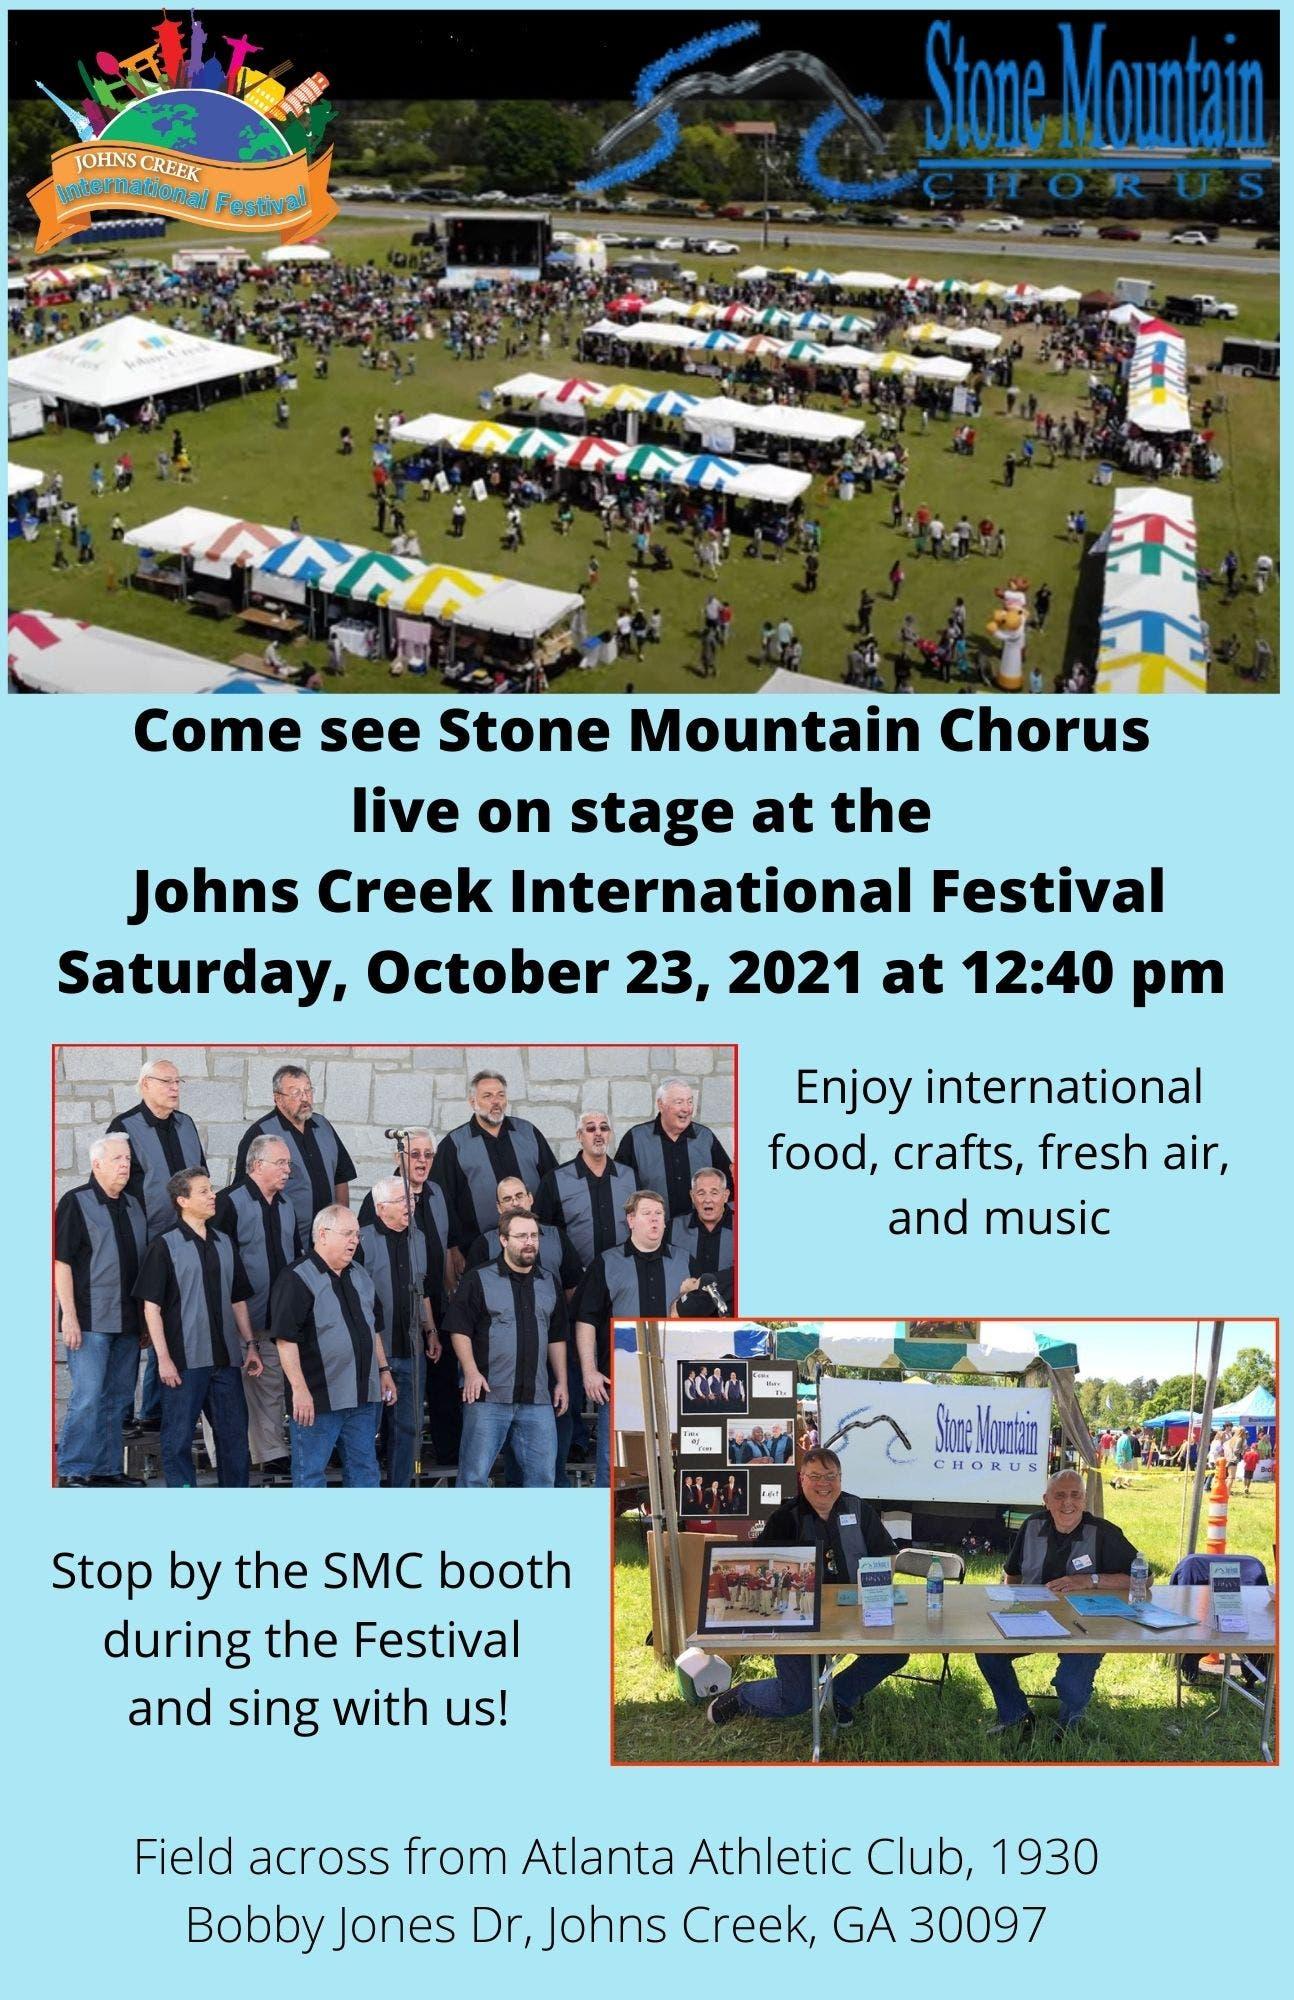 Stone Mountain Chorus at the Johns Creek International Festival